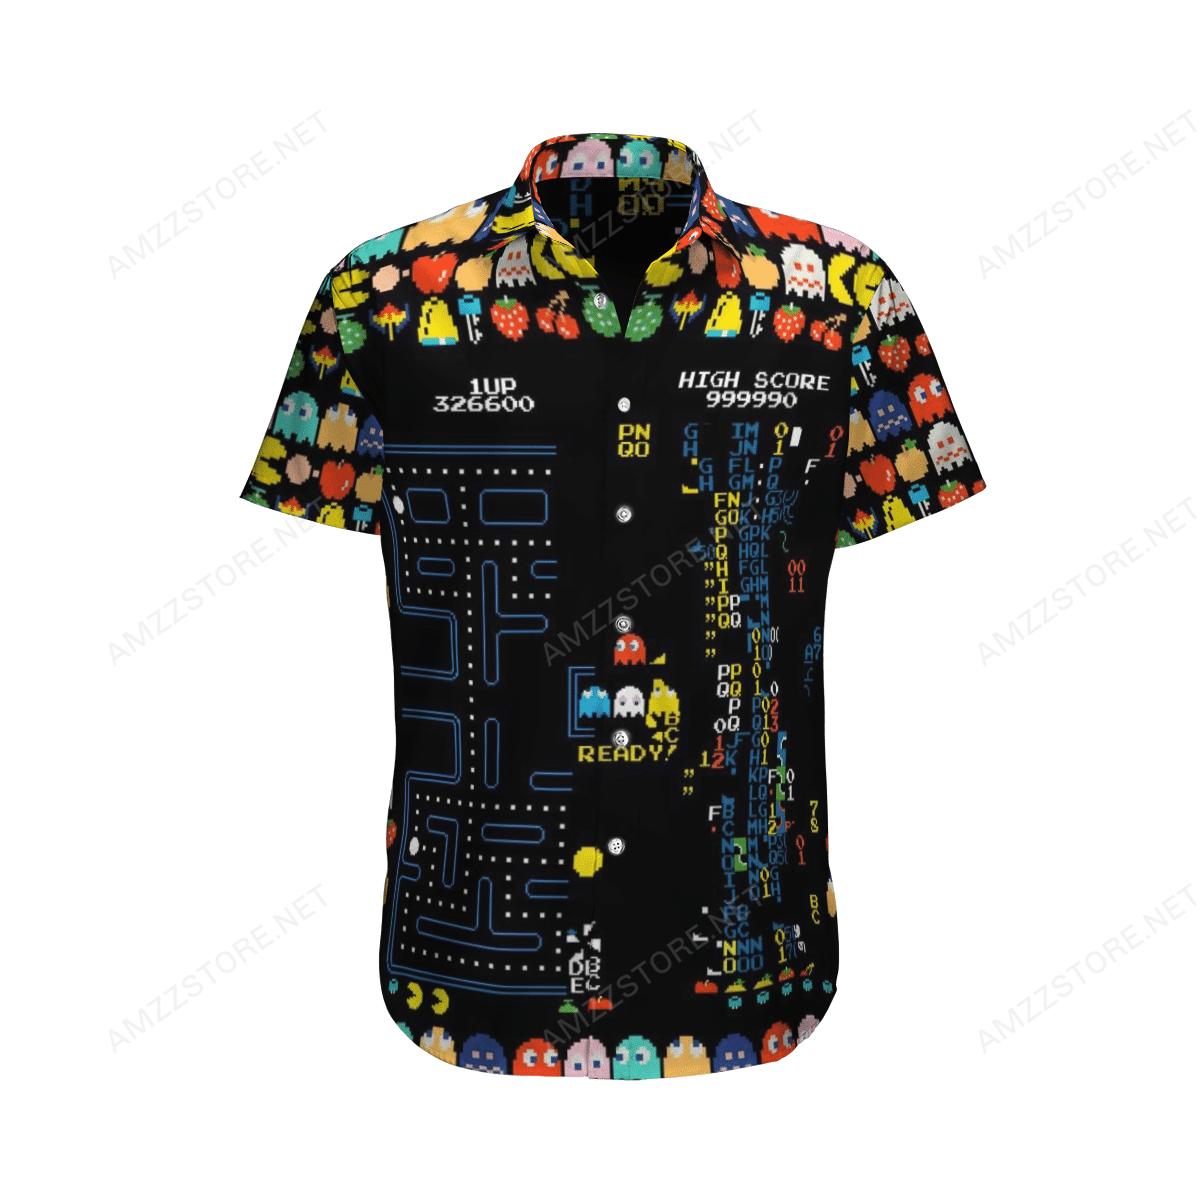 Retro Game Pacman Hawaiian Shirt